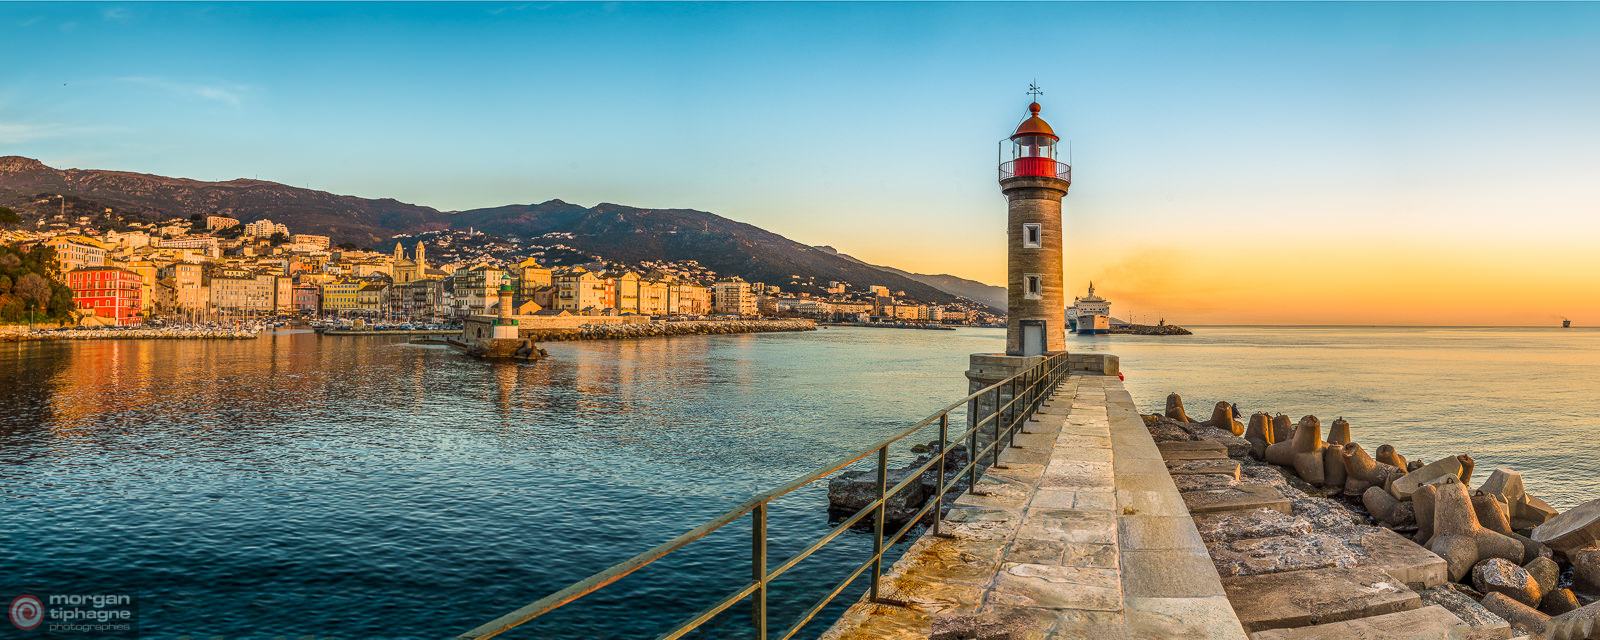 Bastia harbor